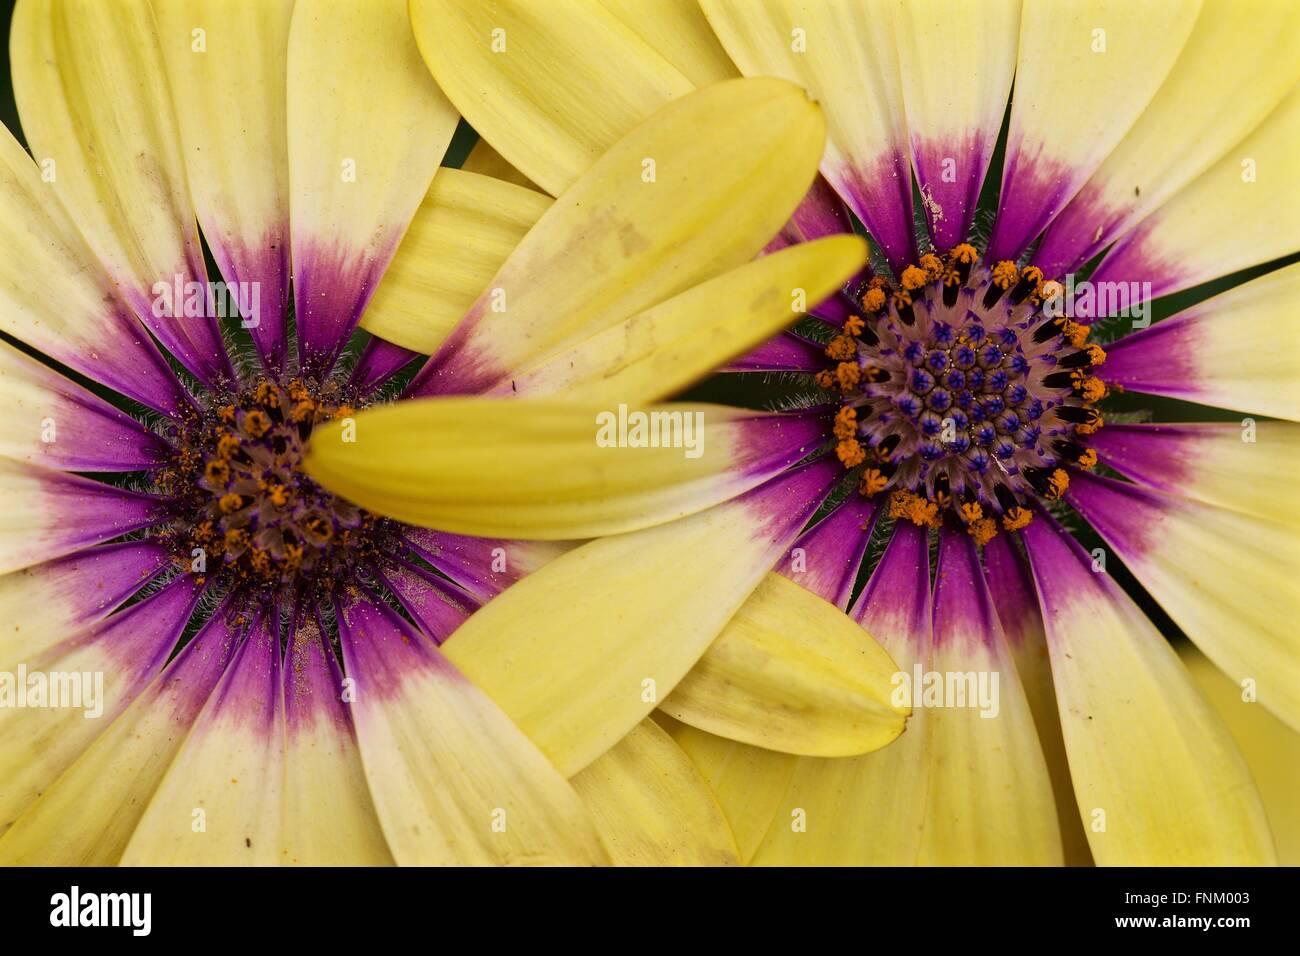 2 Yellow Flowers - Stock Image